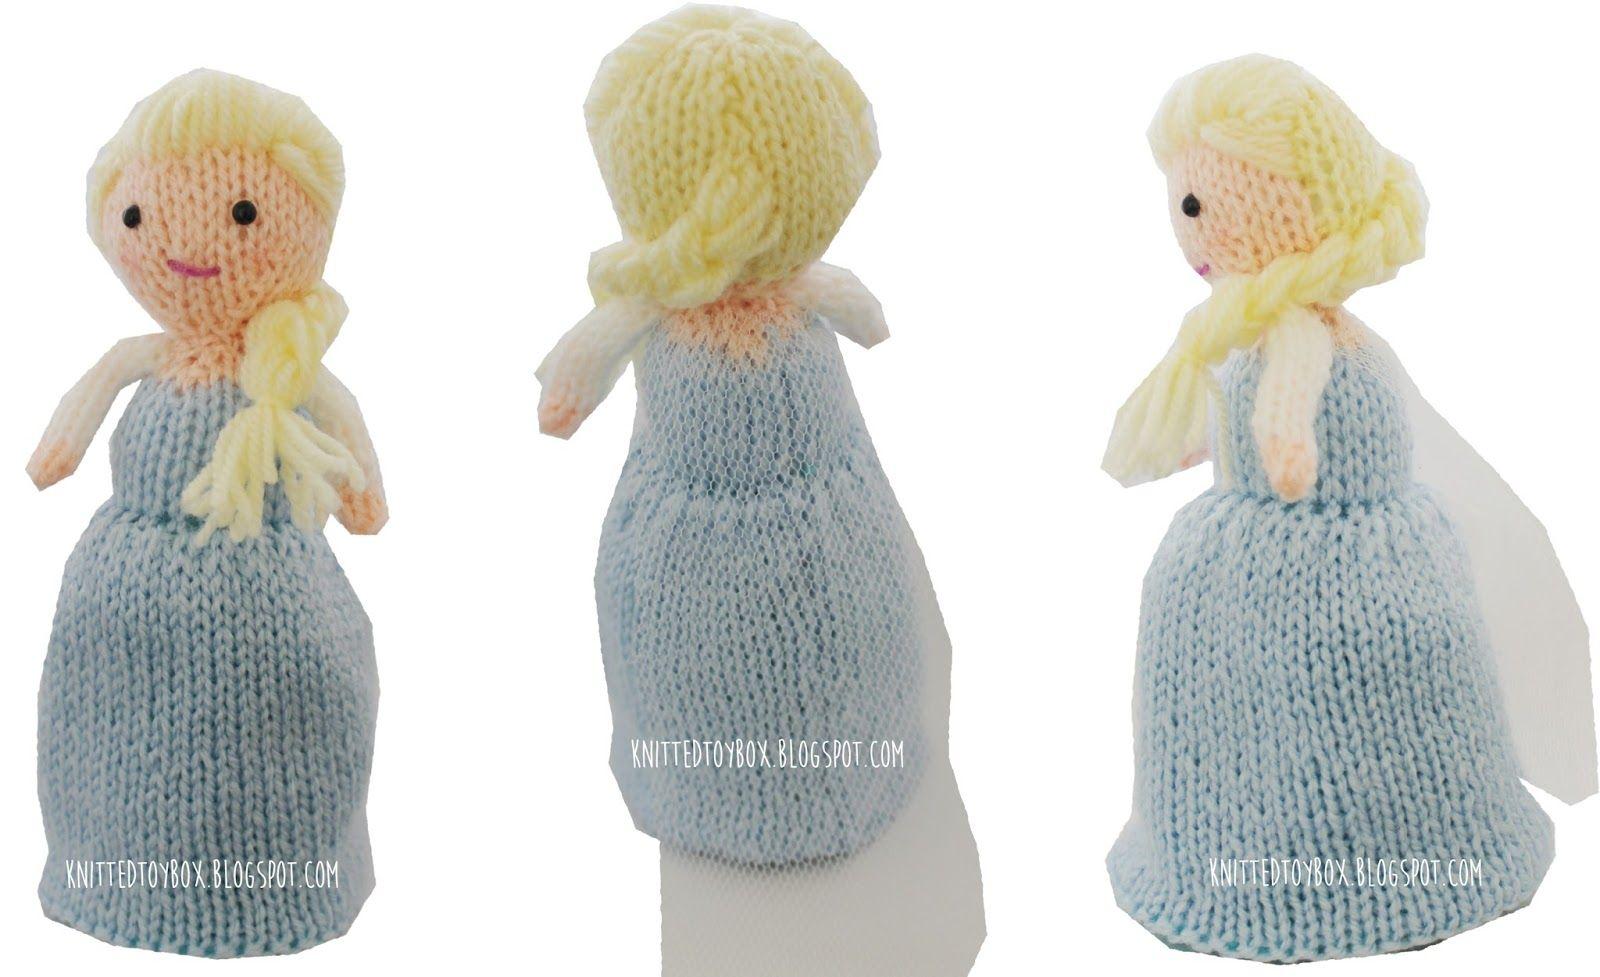 Knitted Toy Box: Elsa Frozen Flip Doll | crochet and knitting ...